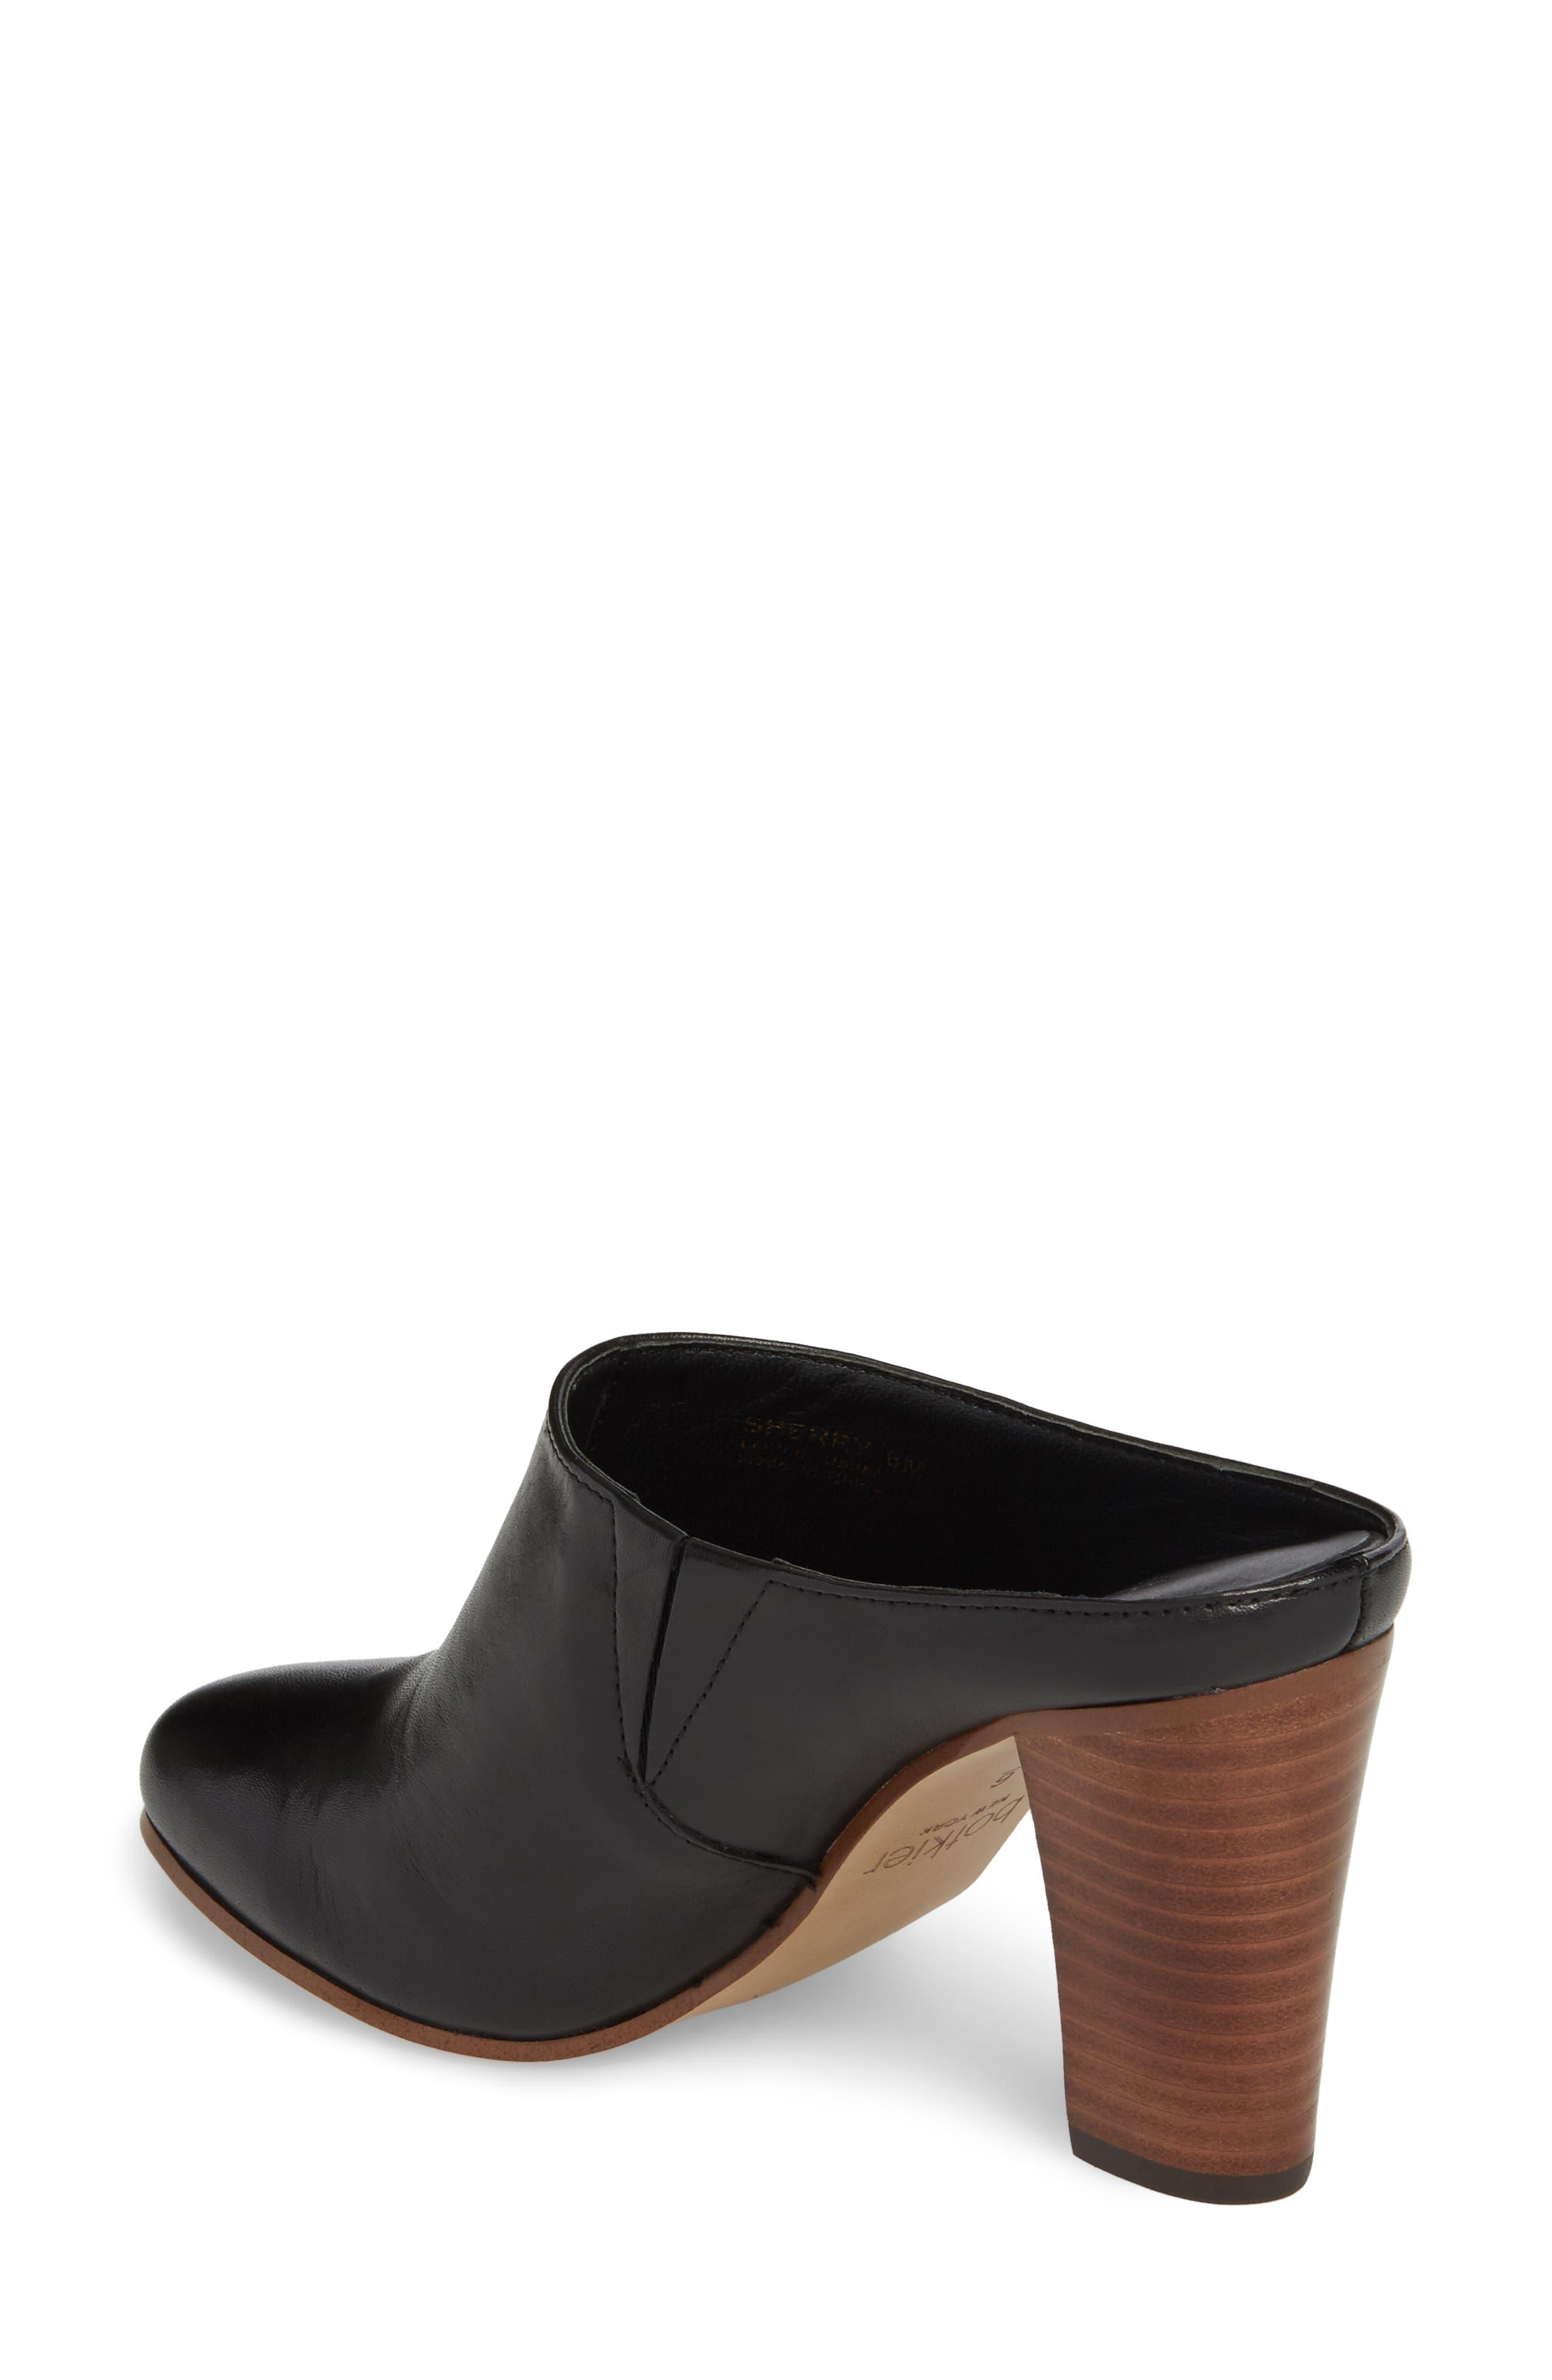 Sherry Mule,                             Alternate thumbnail 2, color,                             Black Nappa Leather